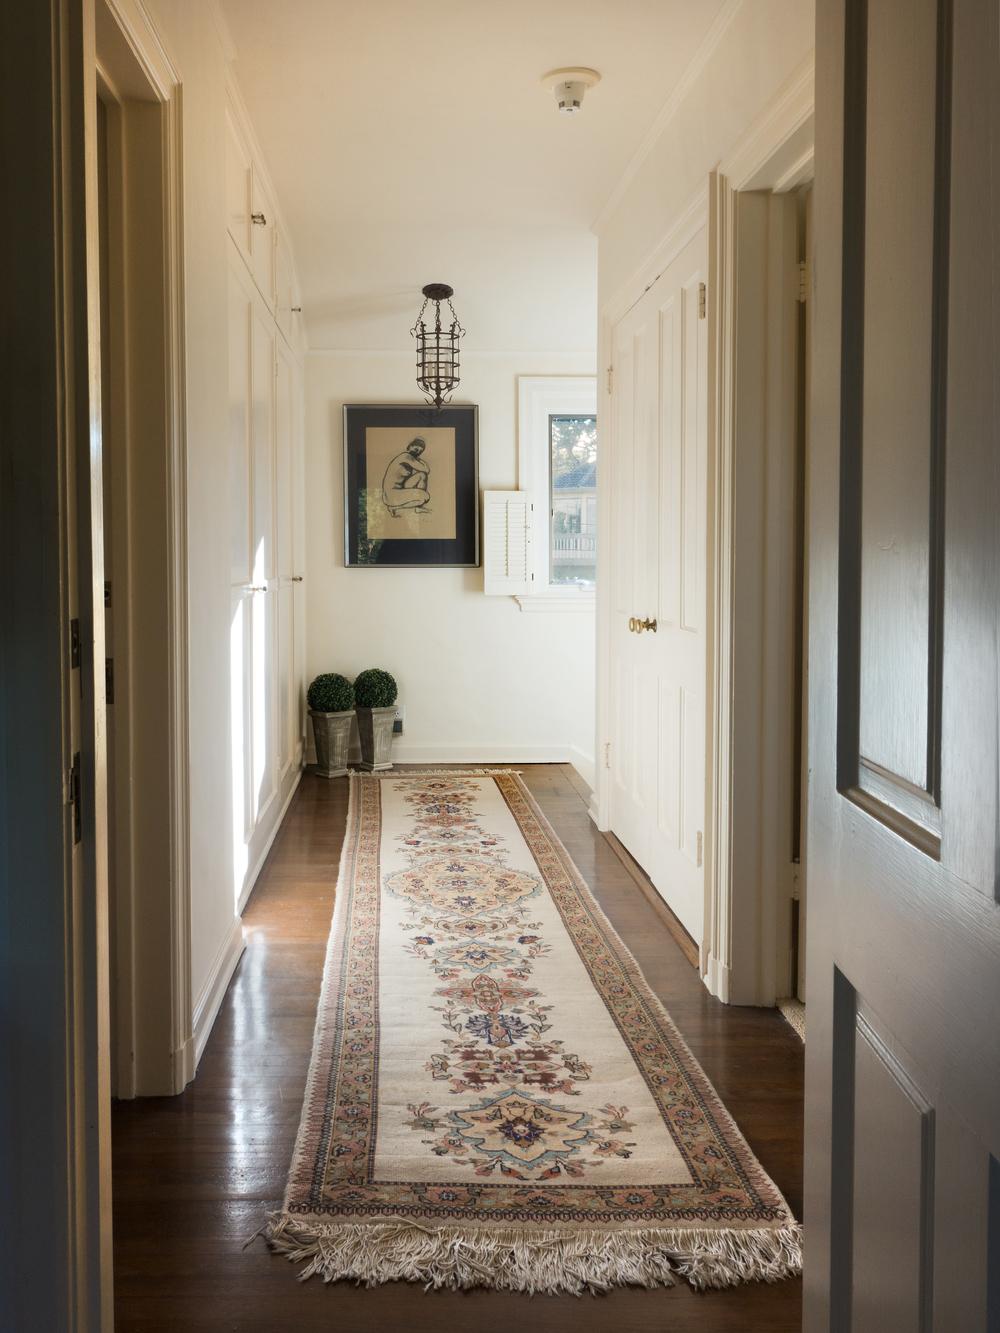 26 hallway.jpg